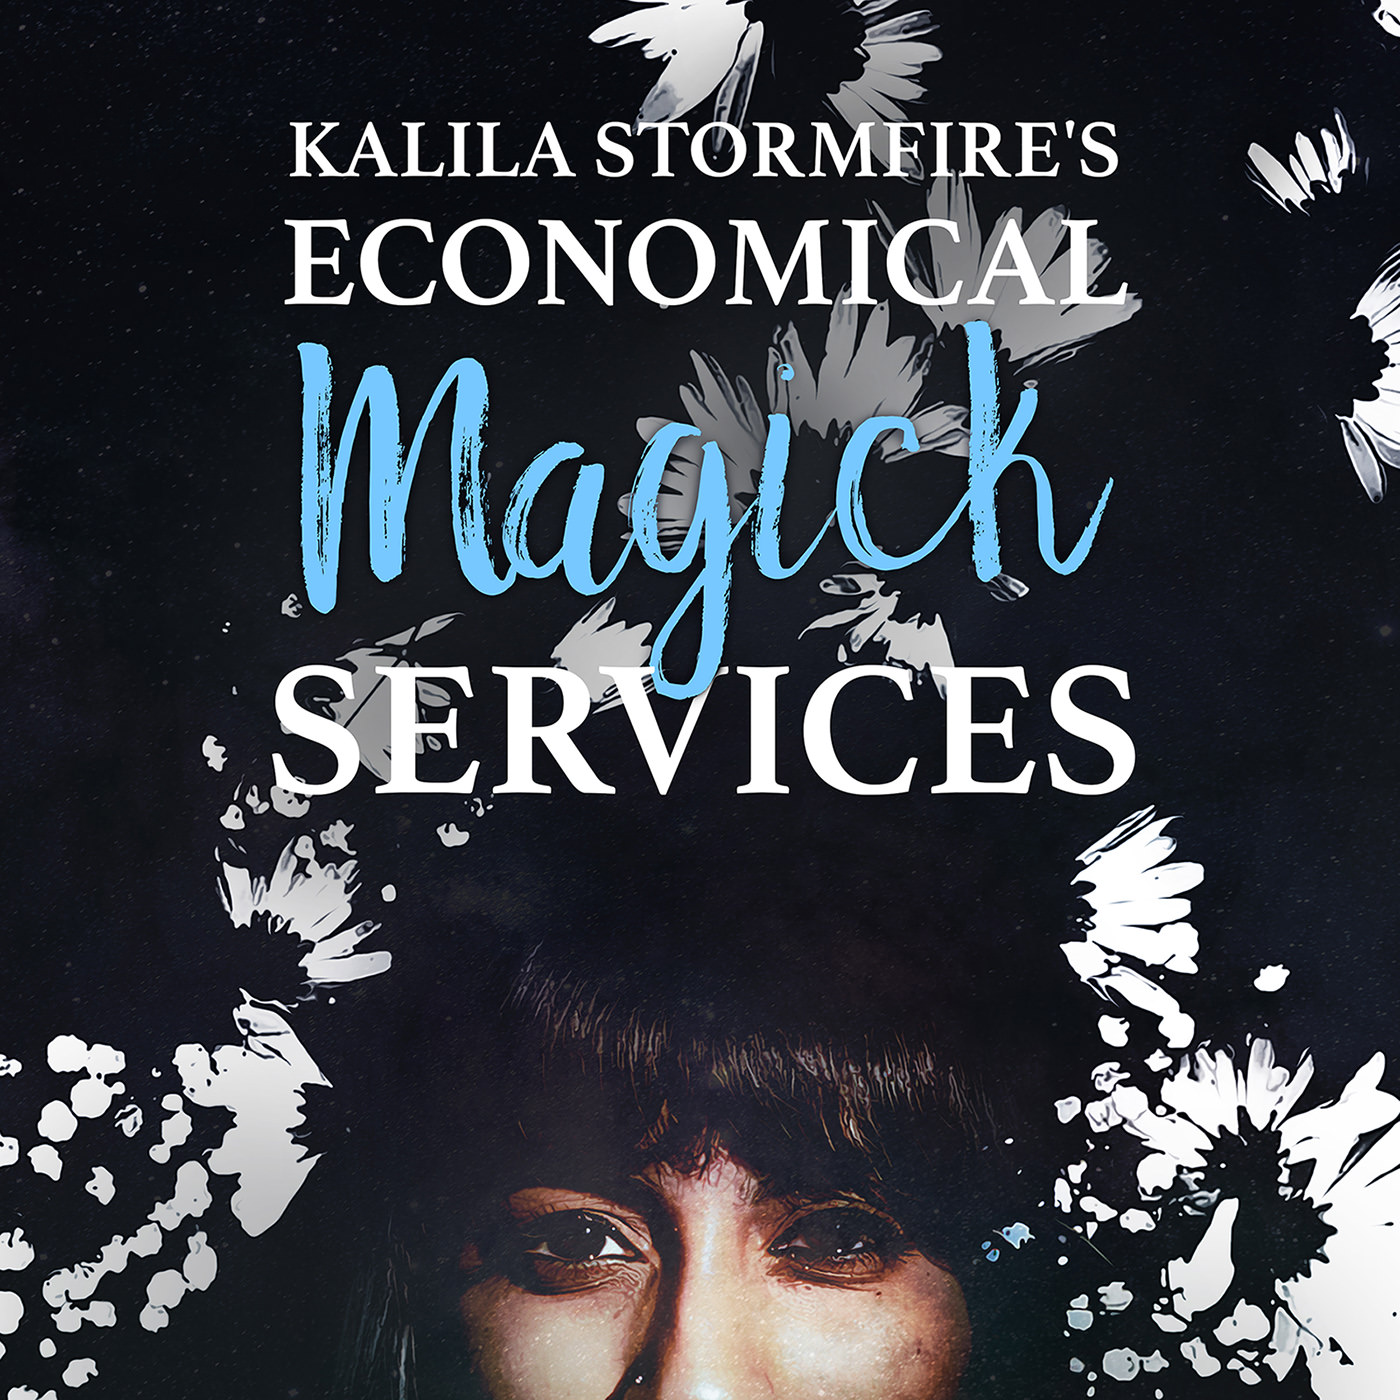 Kalila Stormfire-Compressed.jpg